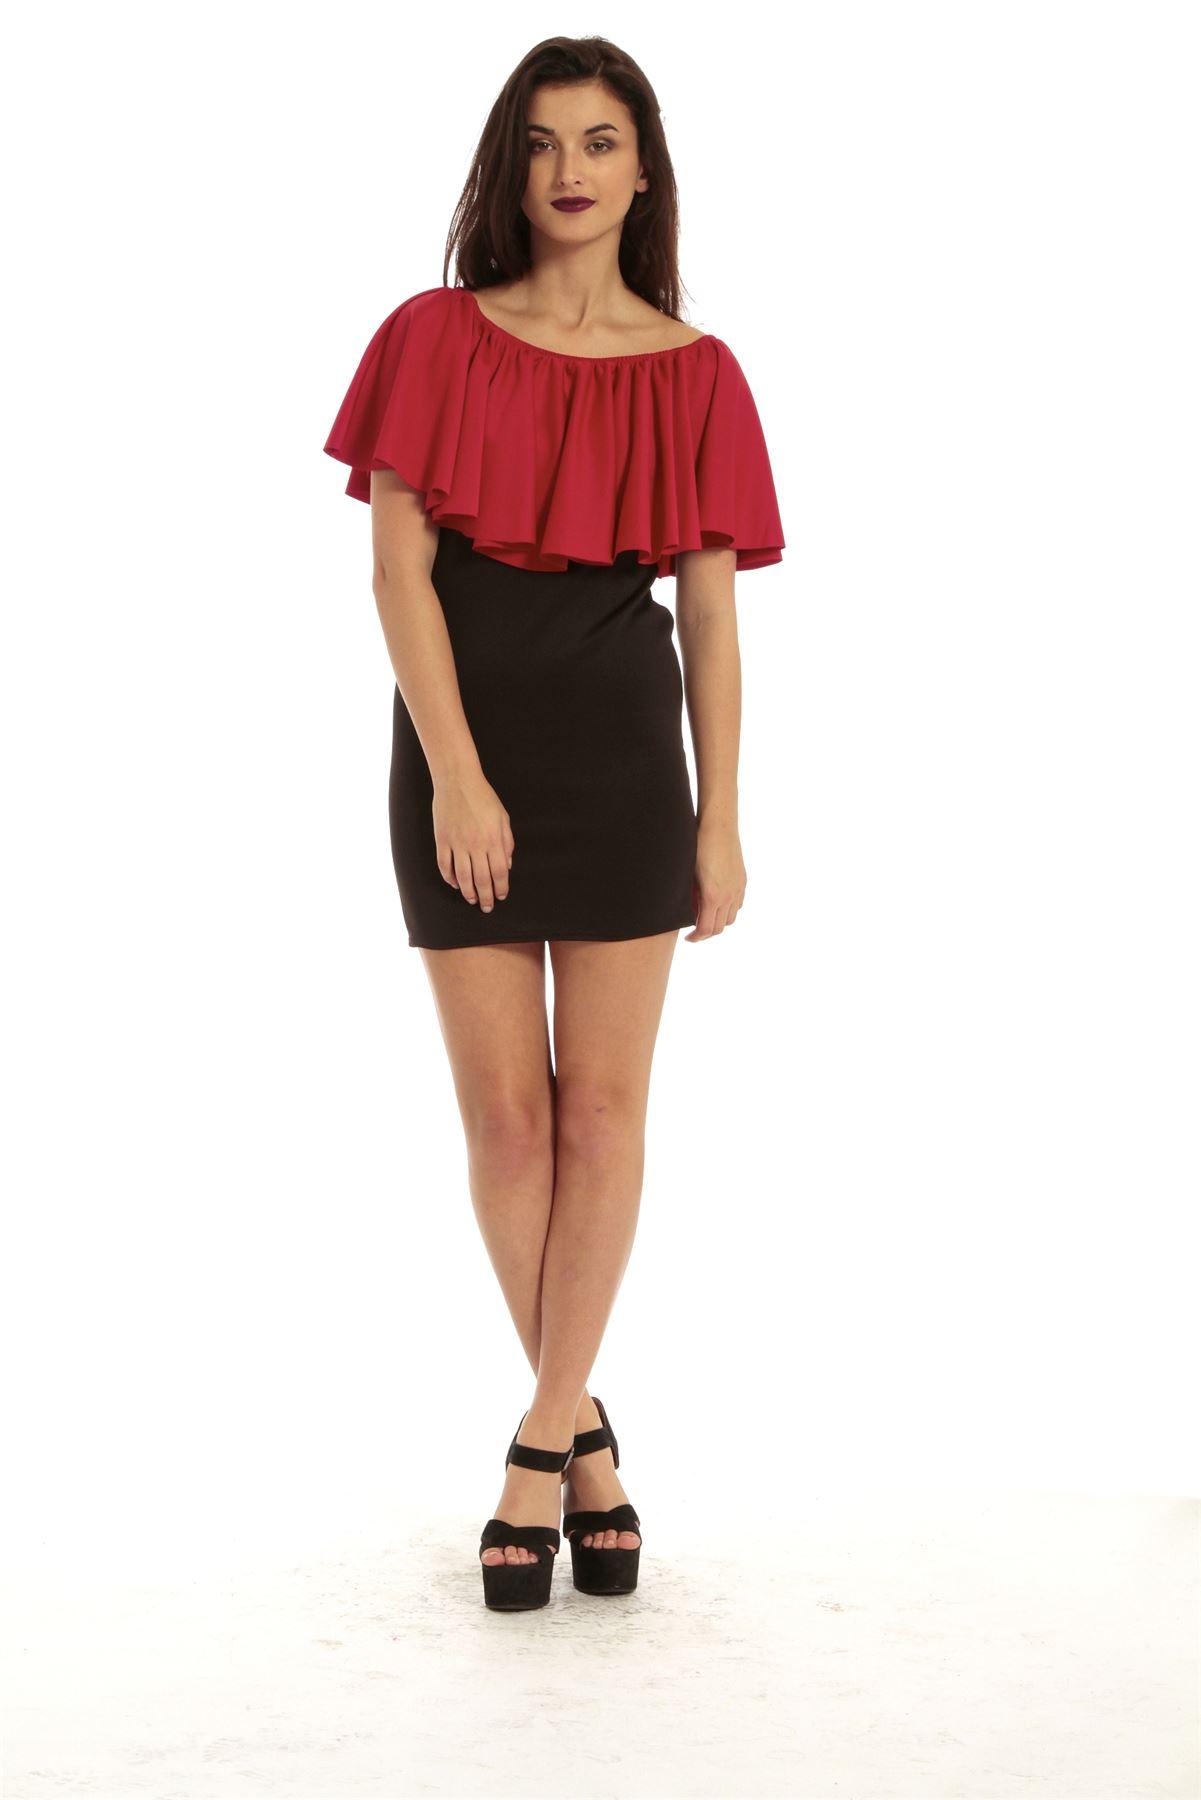 Womens Ruffle Frill Ladies Contrast Off Shoulder Bodycon Mini Dress Peplum Top